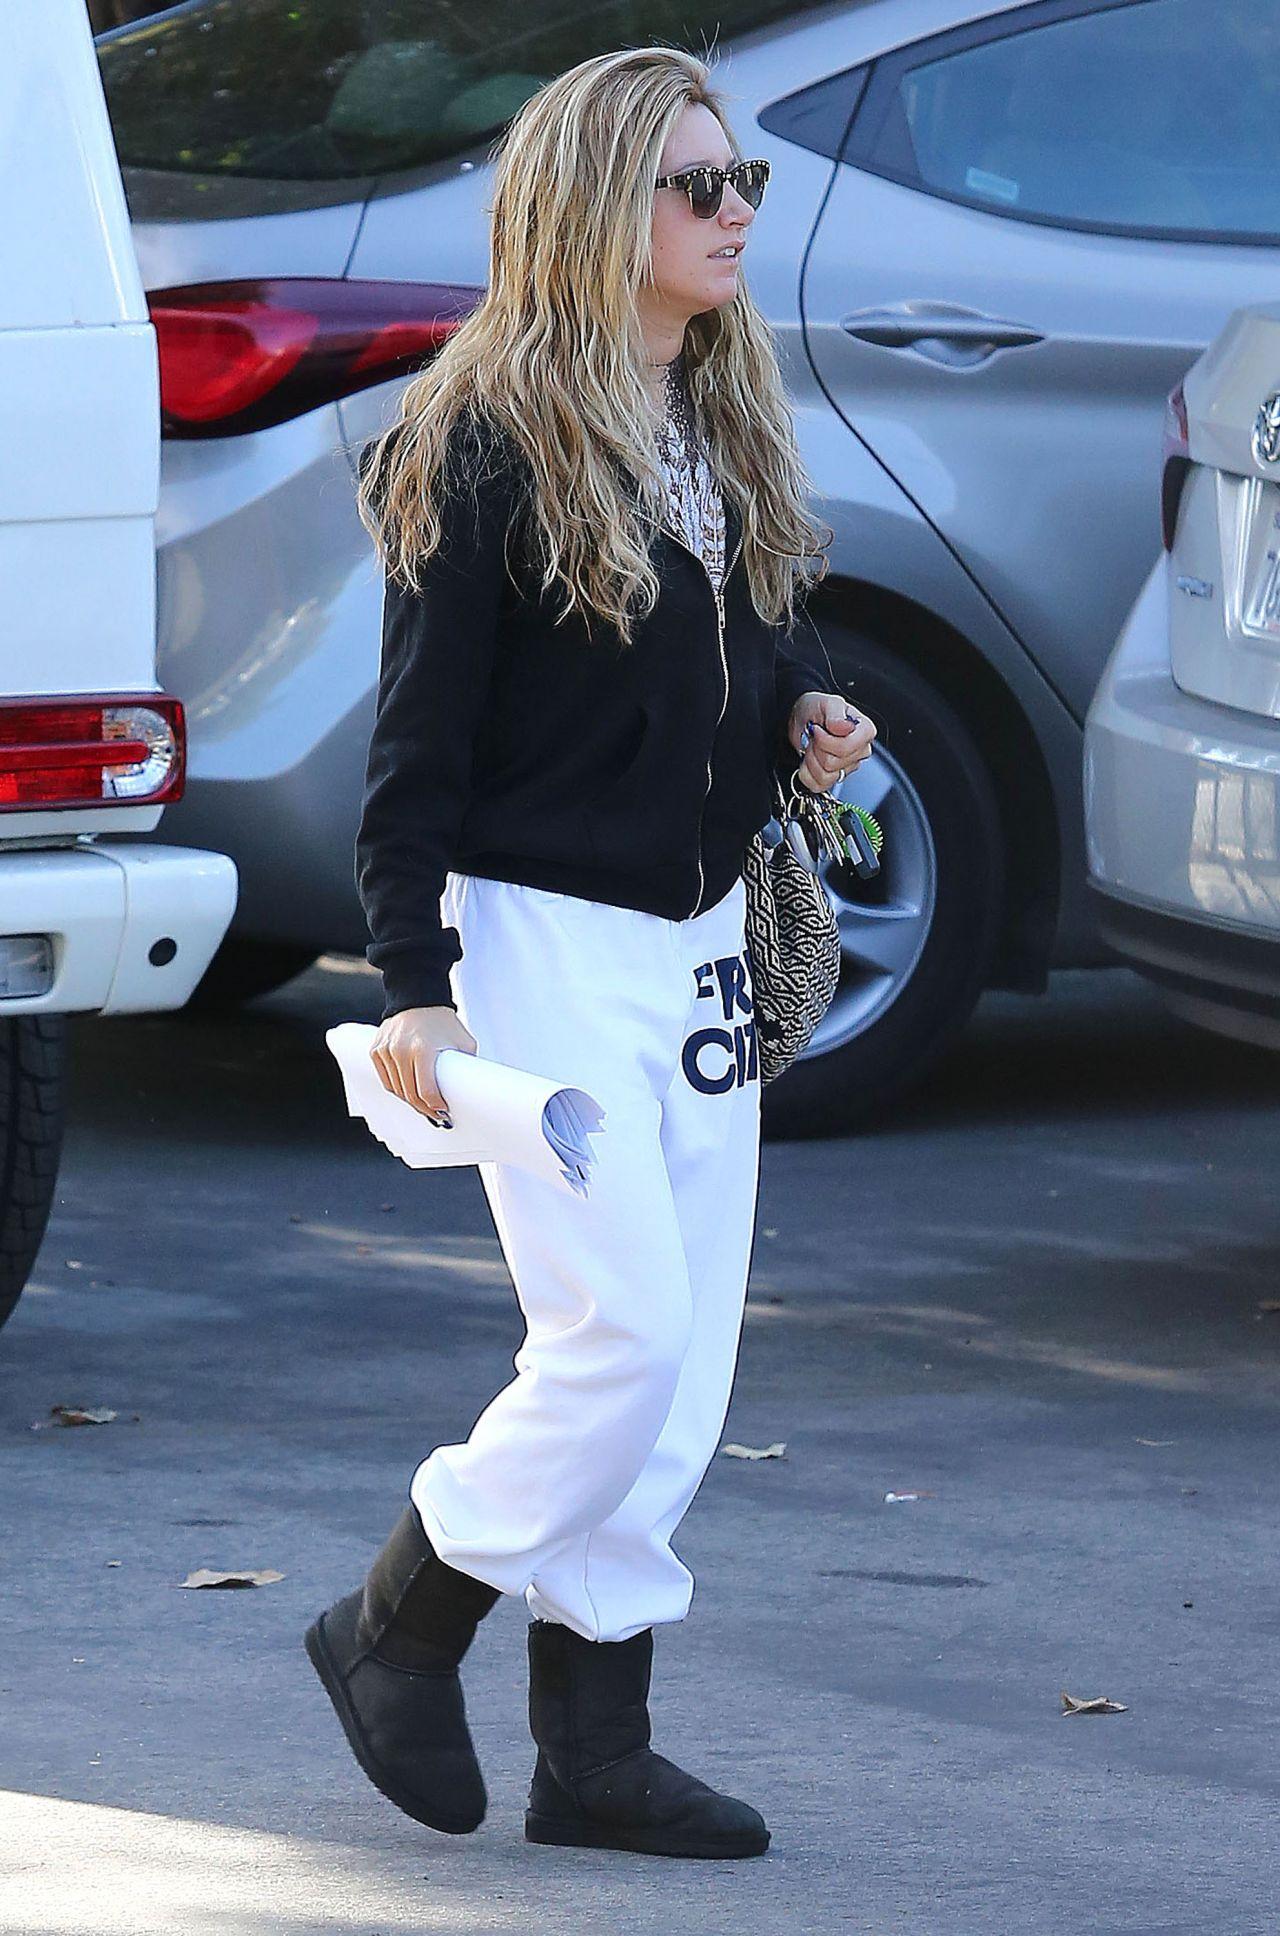 Daleela Echahly Street Fashion: Ashley Tisdale Latest Photos